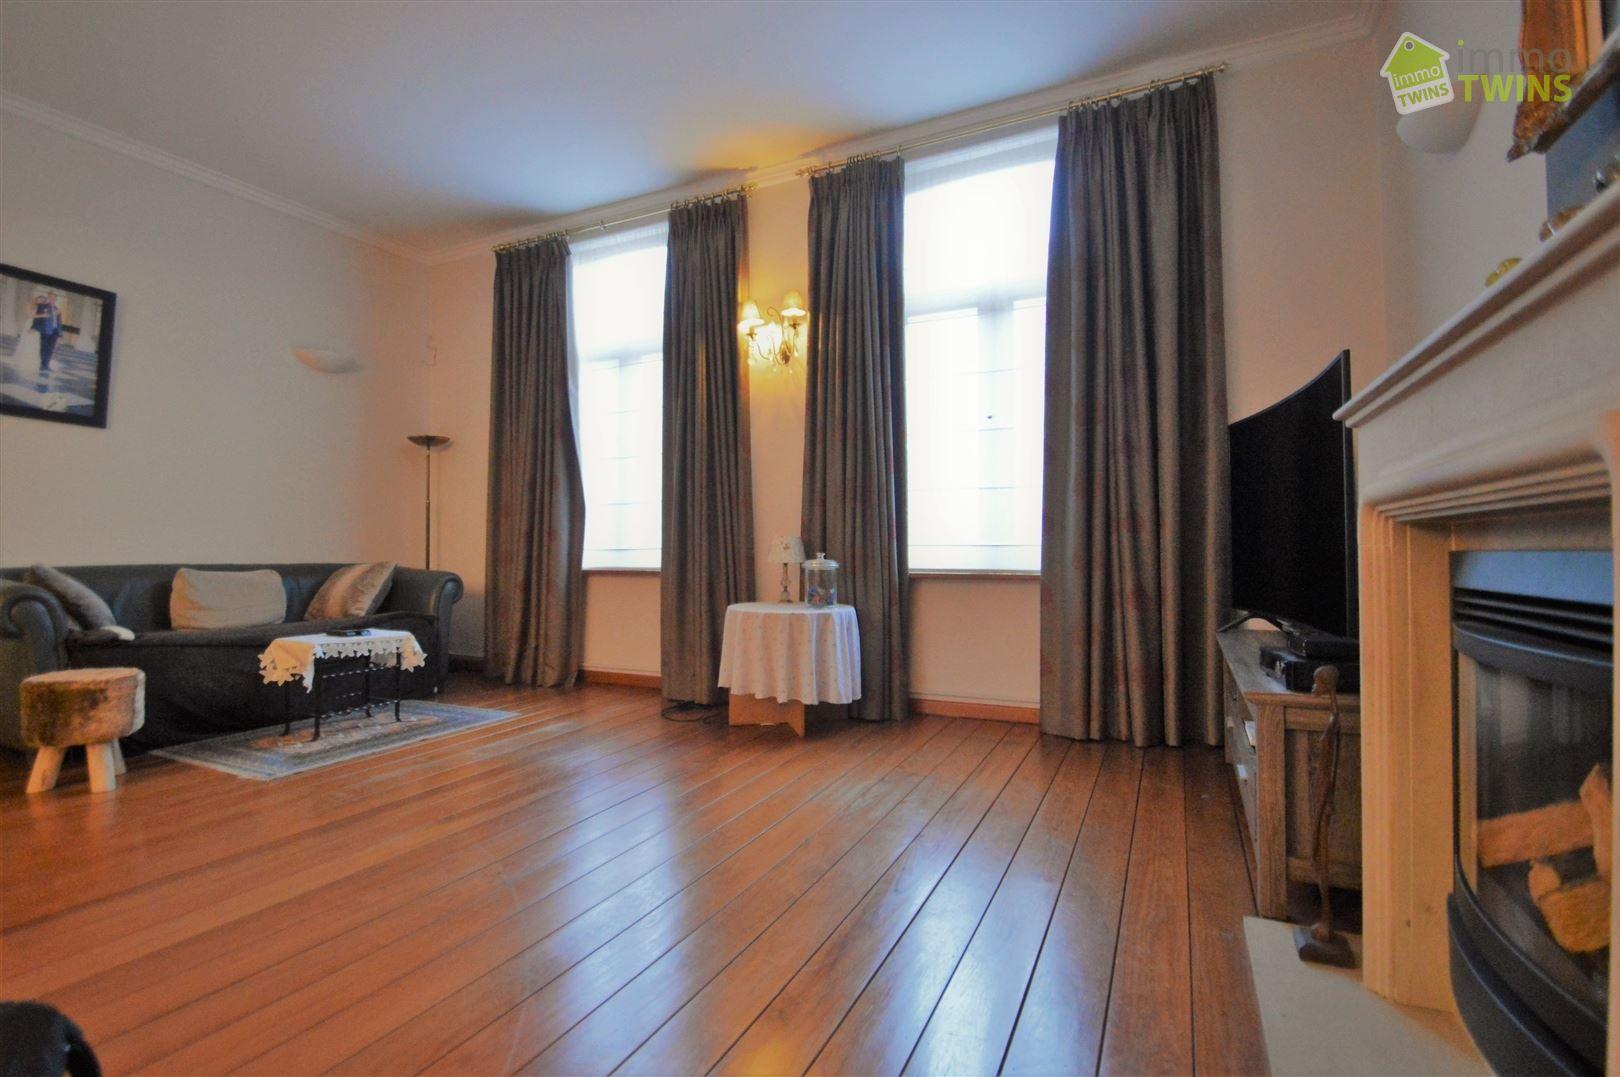 Foto 3 : Duplex/Penthouse te 2890 SINT-AMANDS (België) - Prijs € 429.000